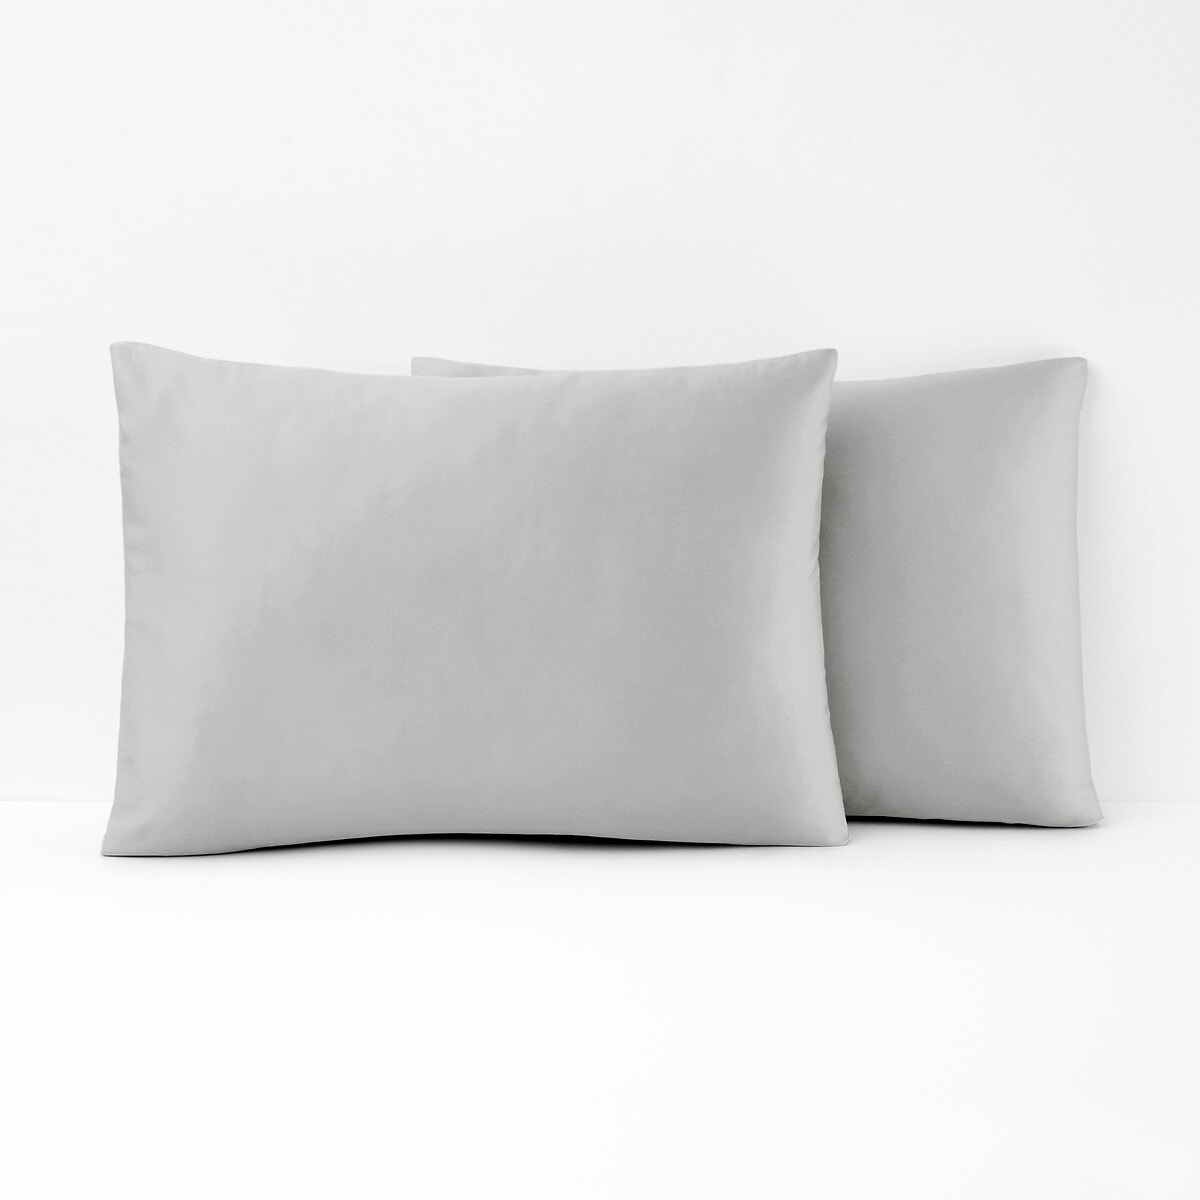 Scenarioコットンサテン 枕カバー